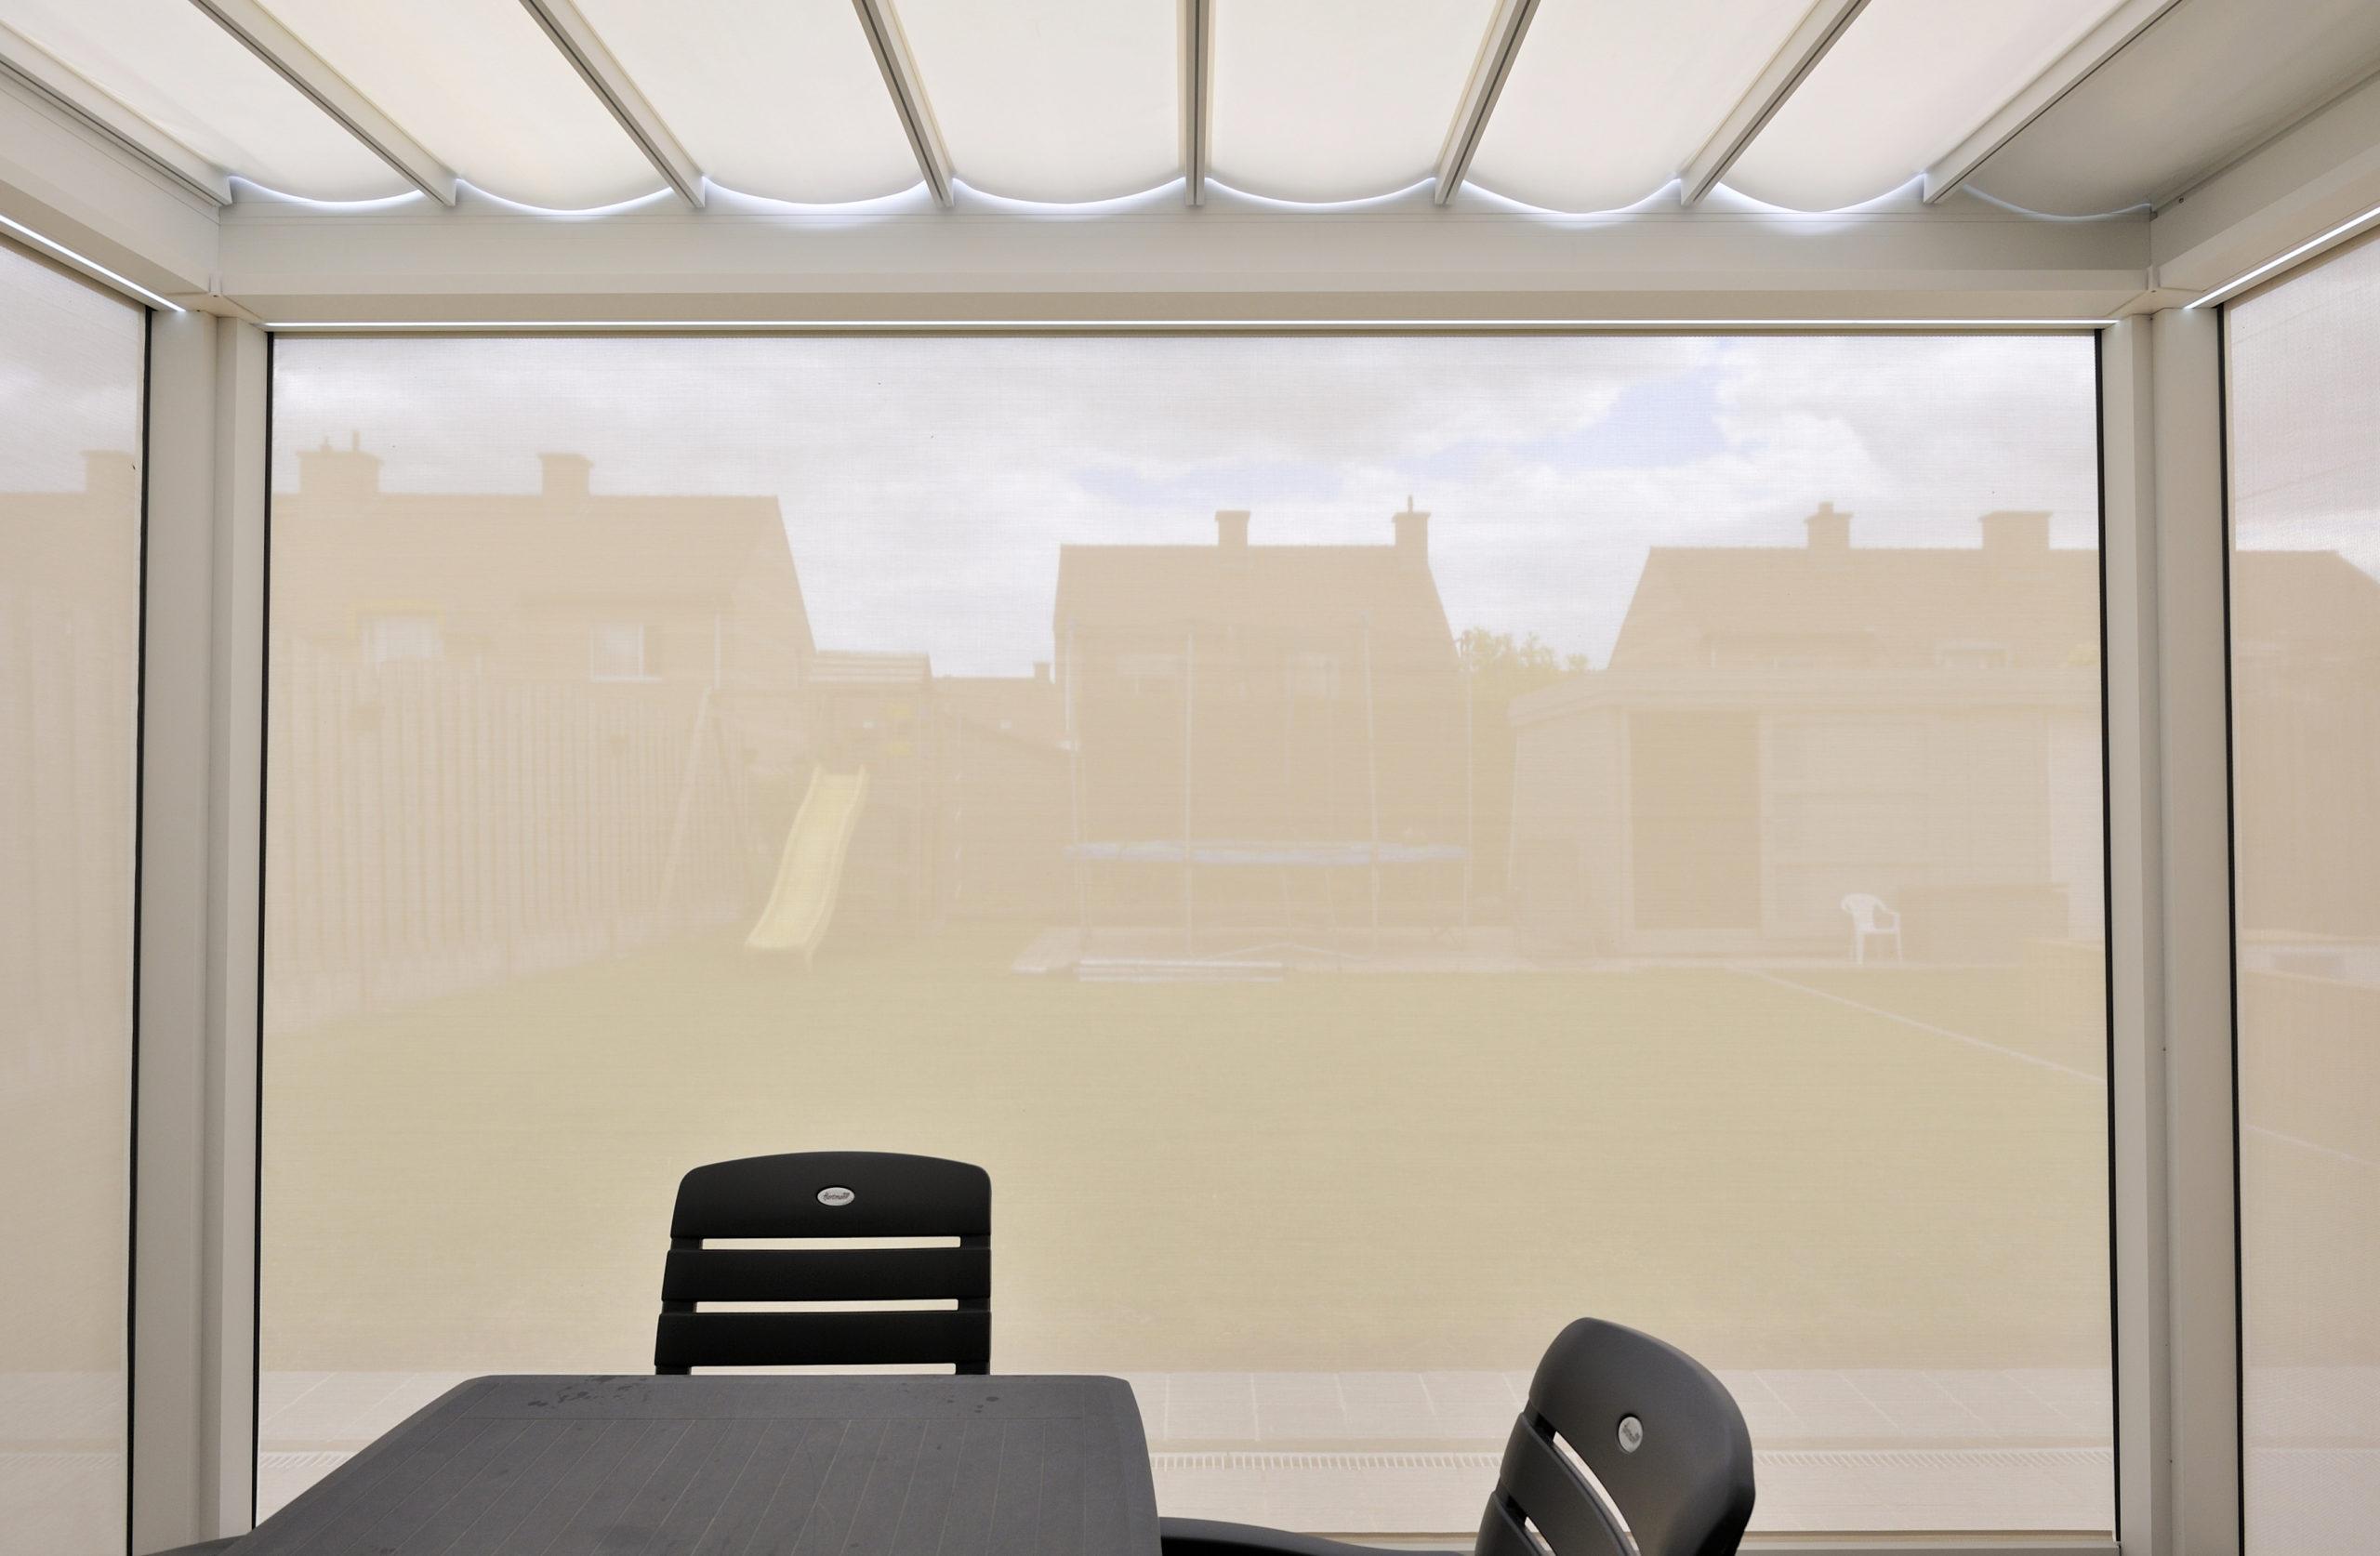 Brustor B-300 Outdoor Living - view from inside - BRU0077